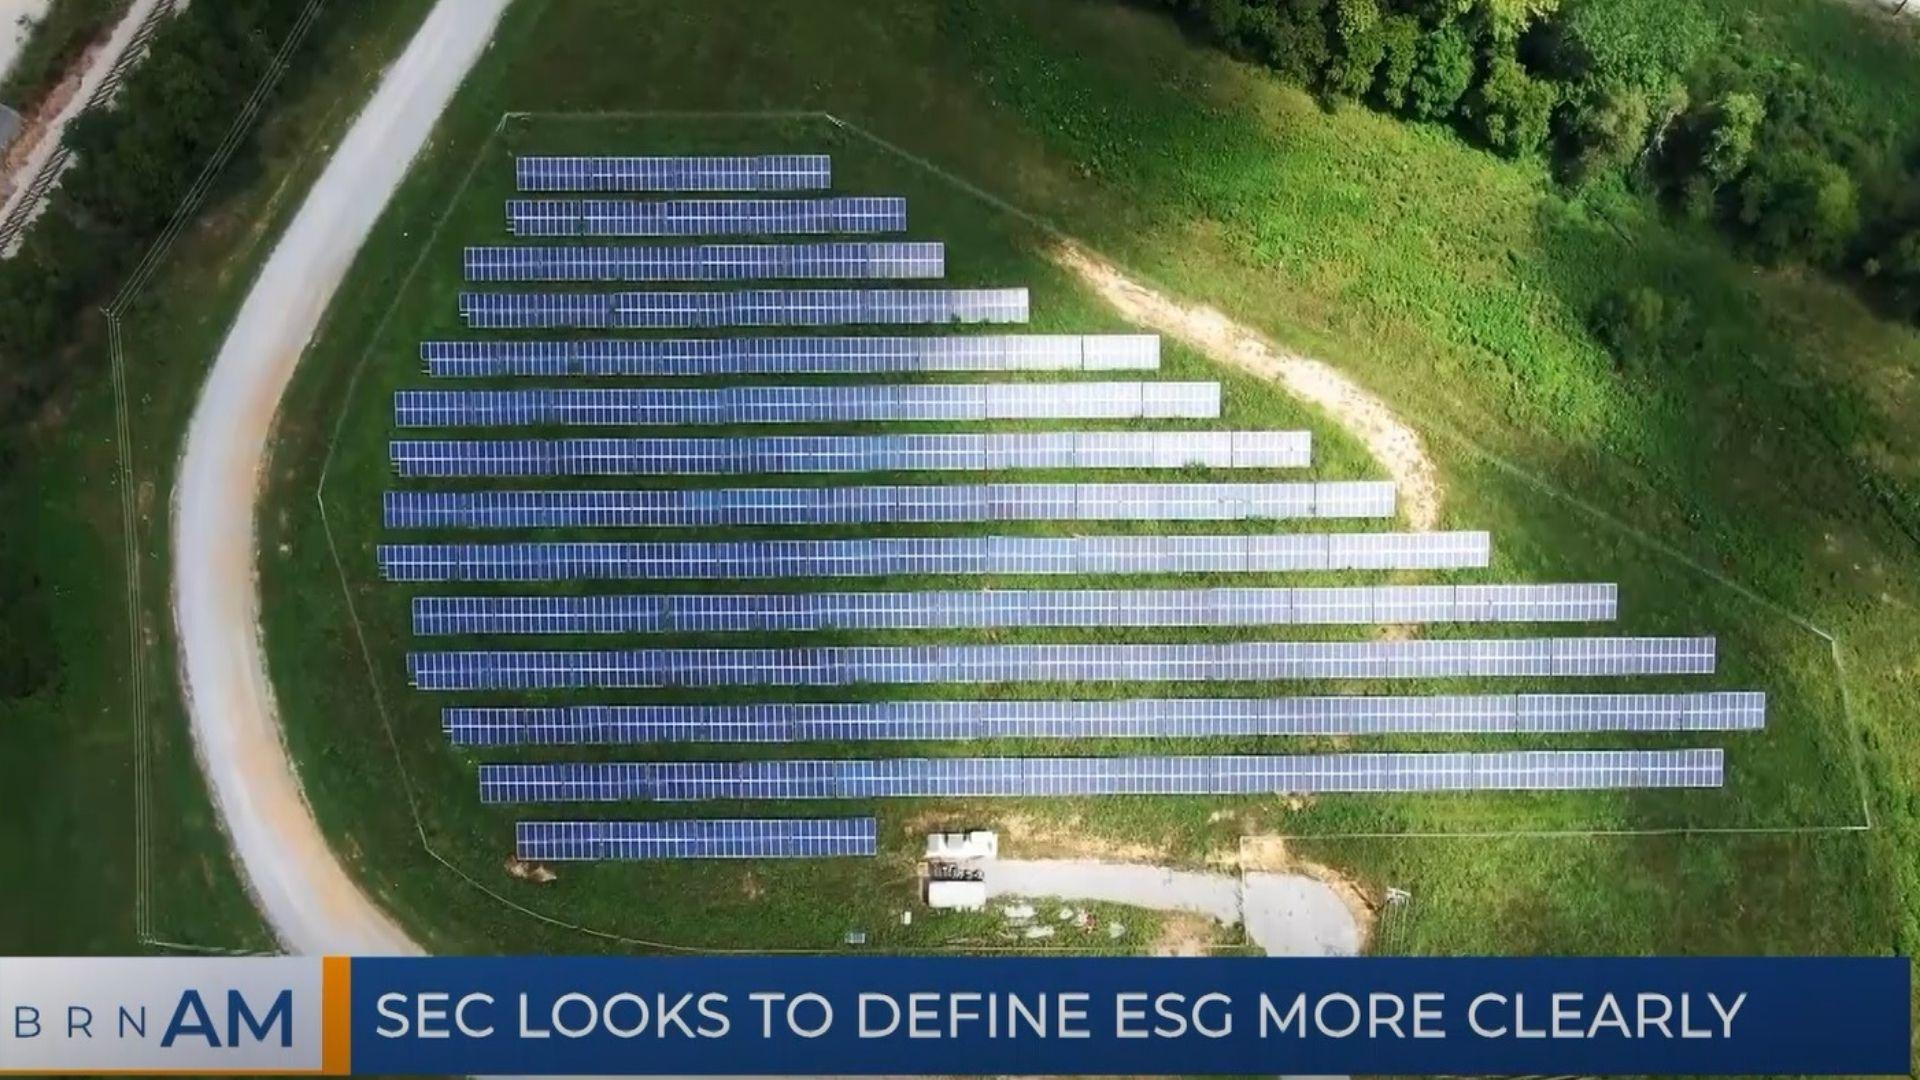 BRN AM | ESG: Fad or Future? & SEC looks to define ESG more clearly